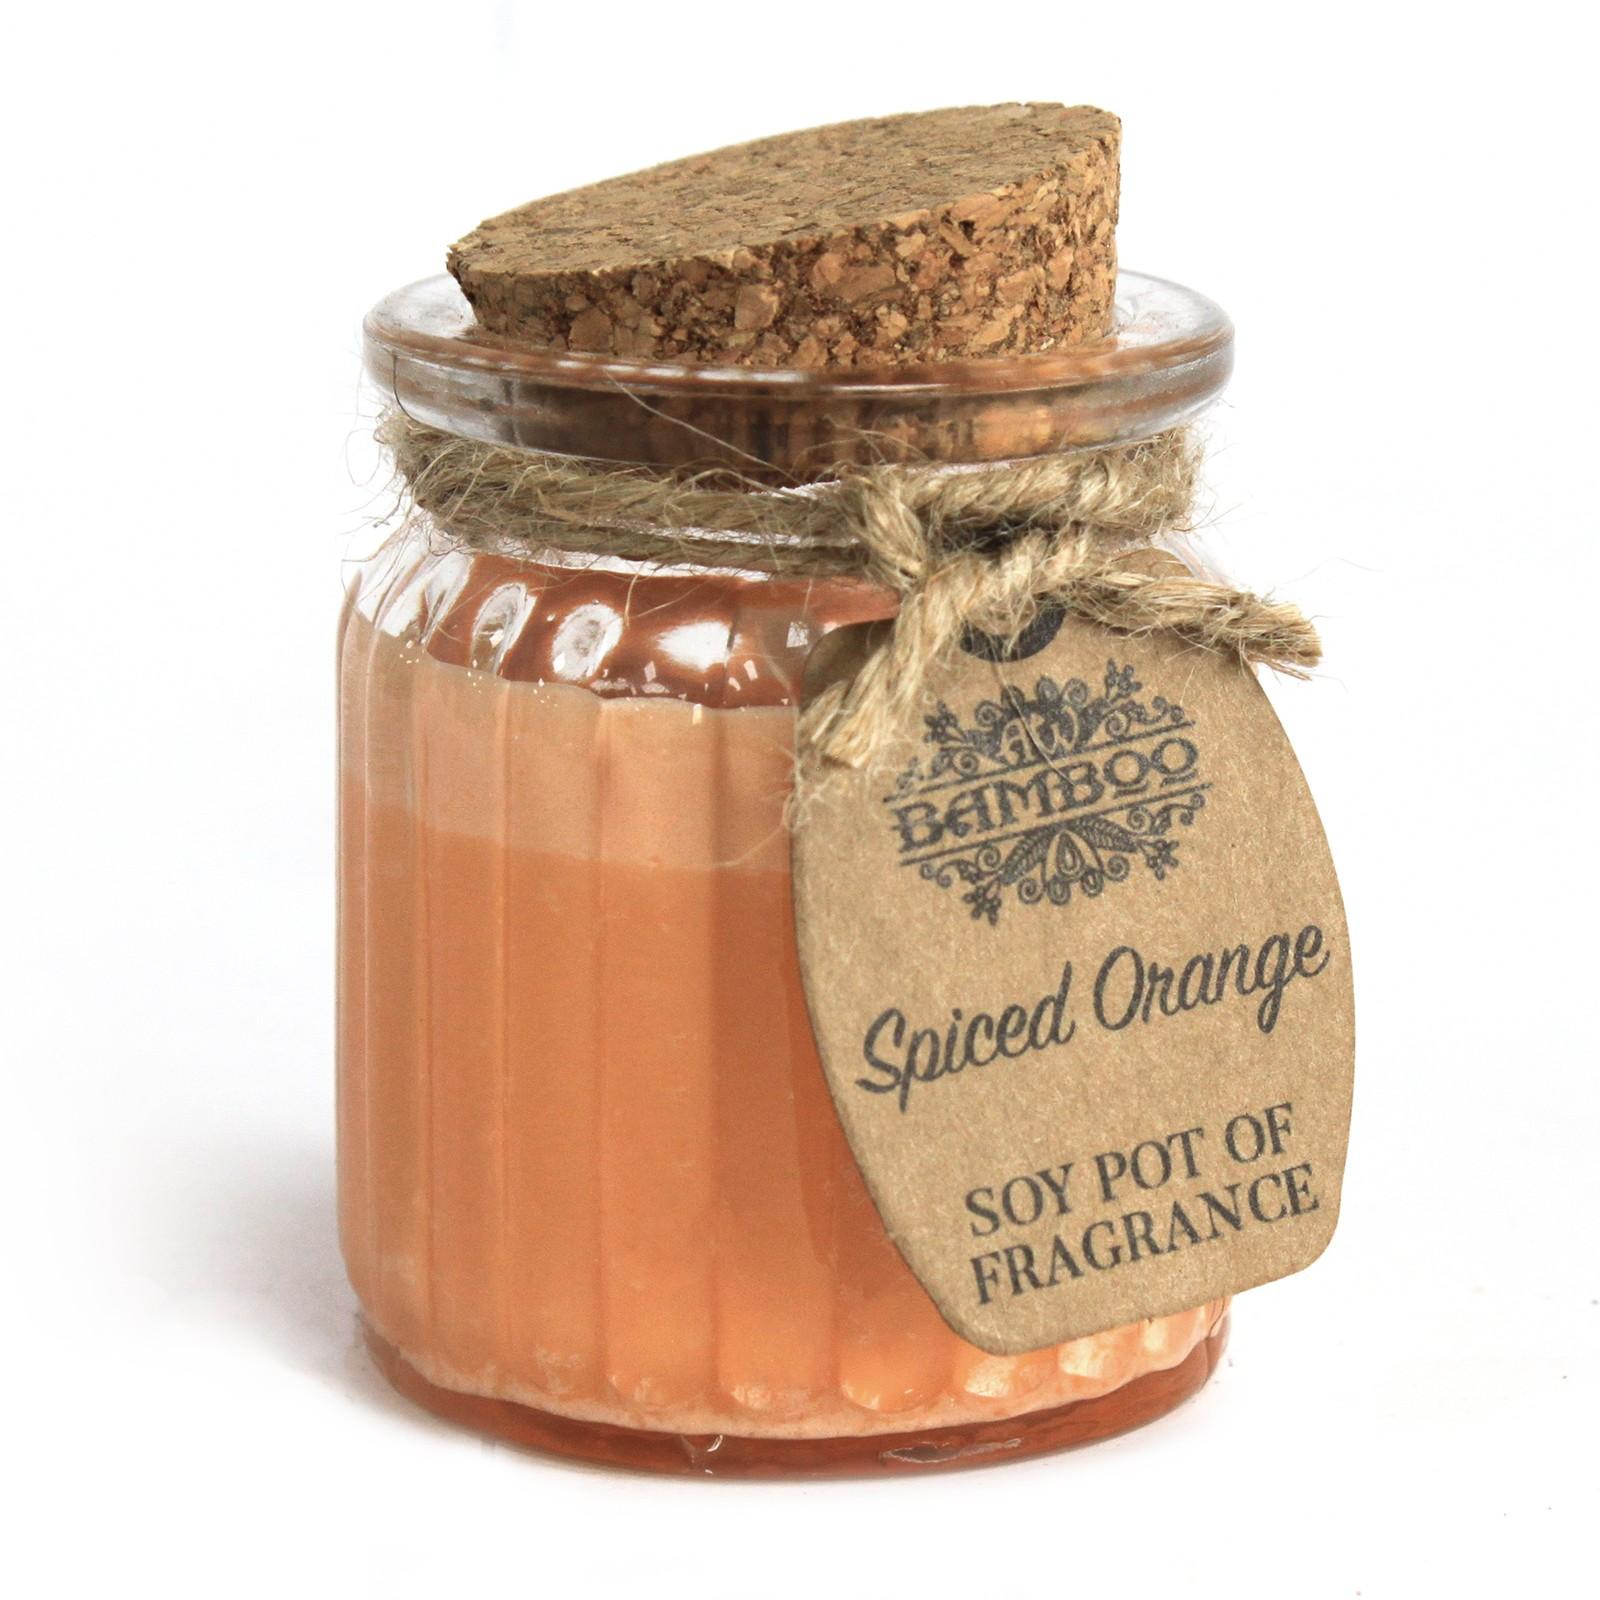 Spiced Orange Soy Pot of Fragrance Candles